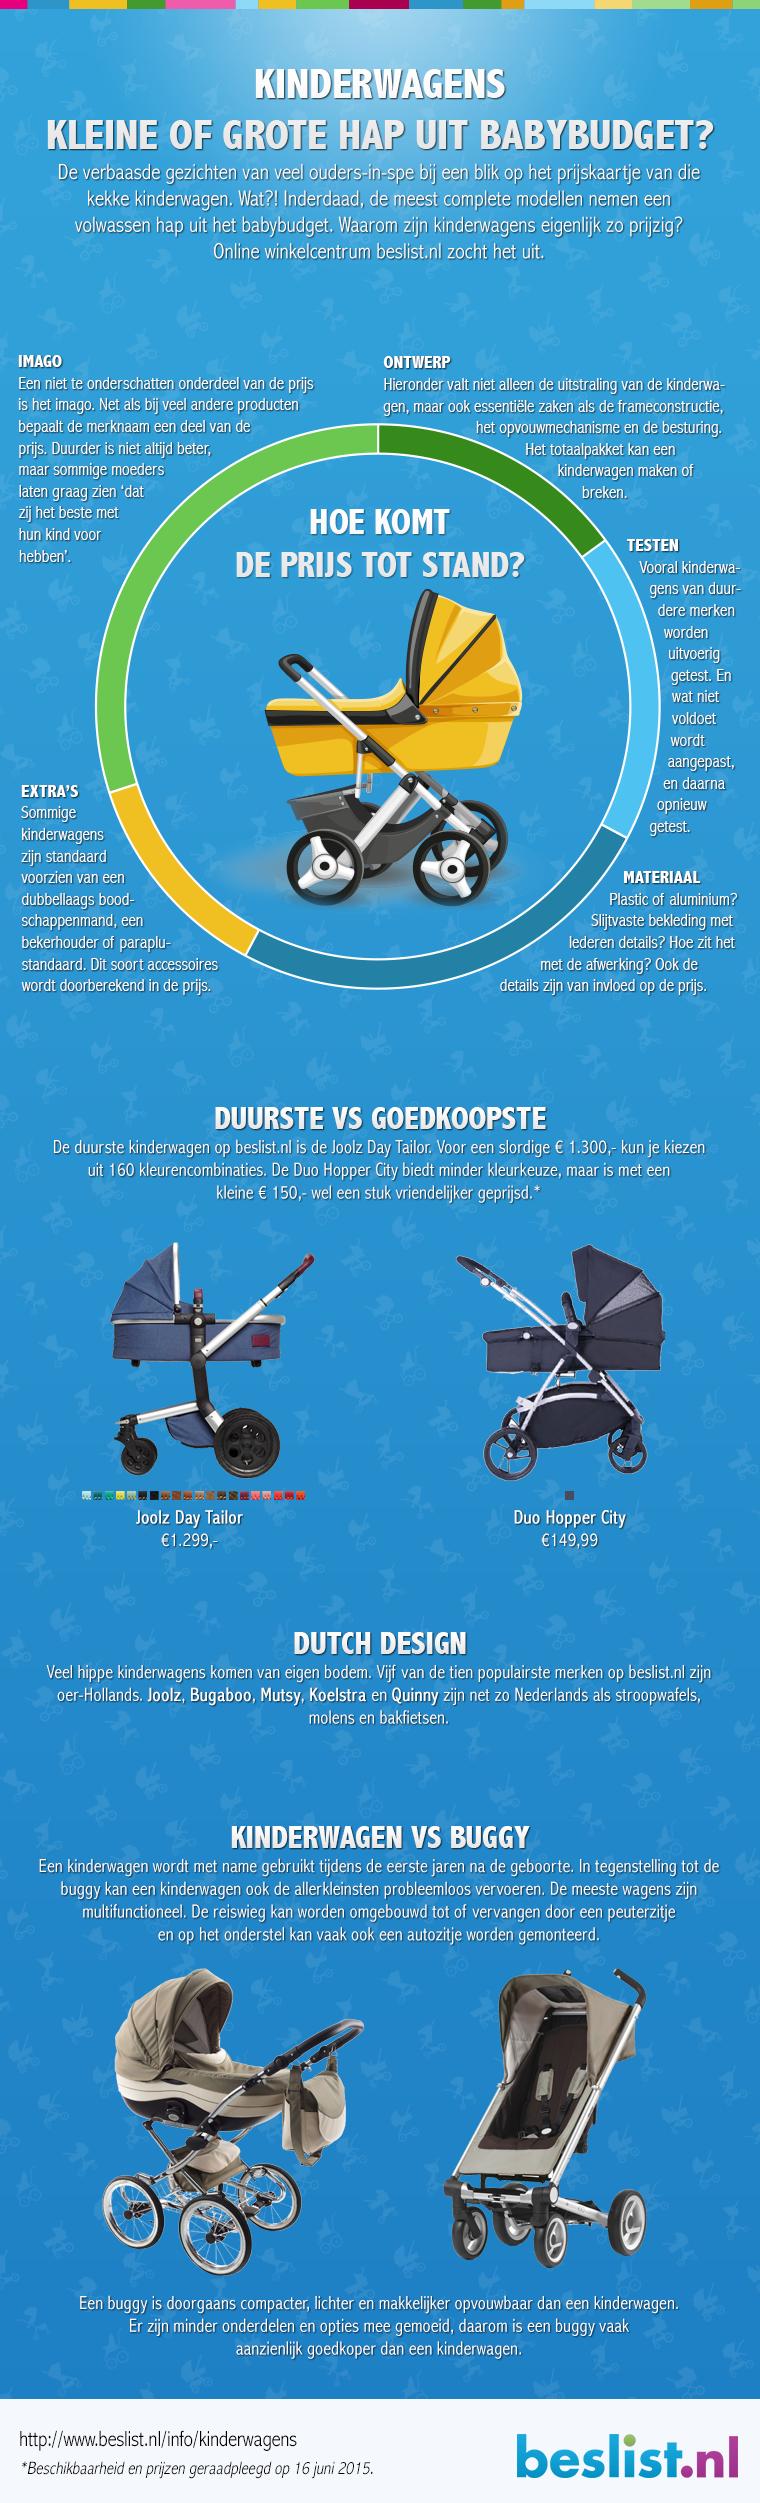 Infographic: Kinderwagens